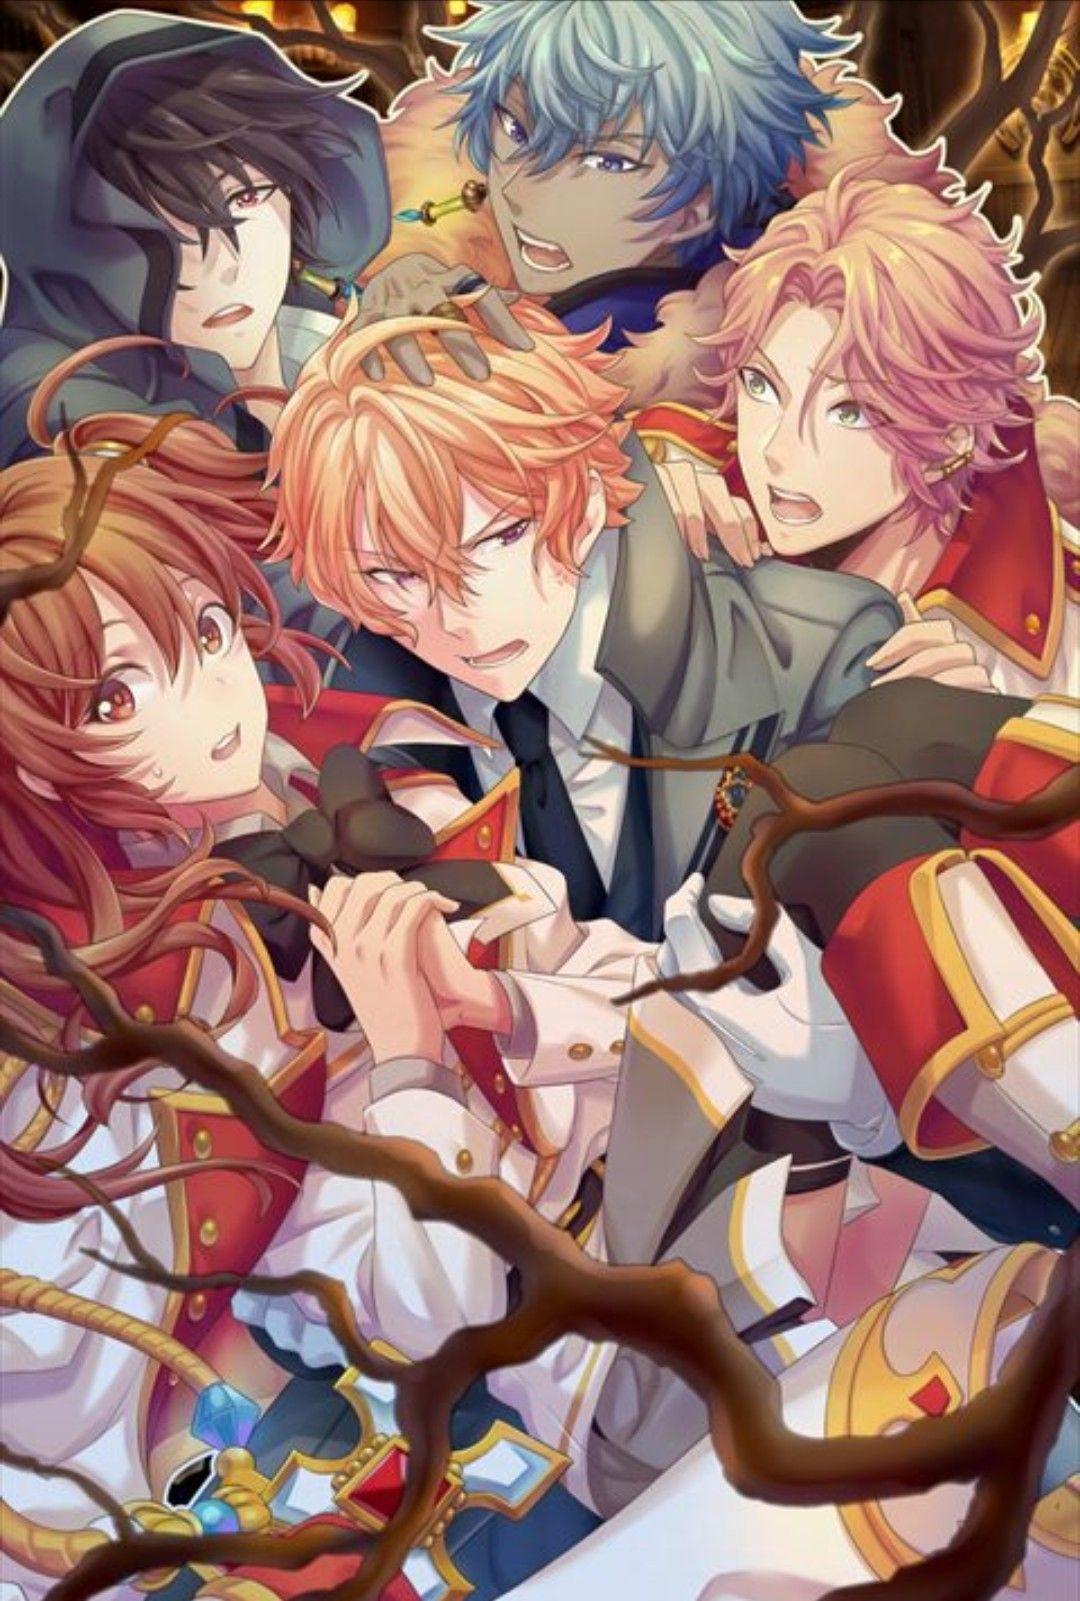 Klaus goldstein anime love story anime